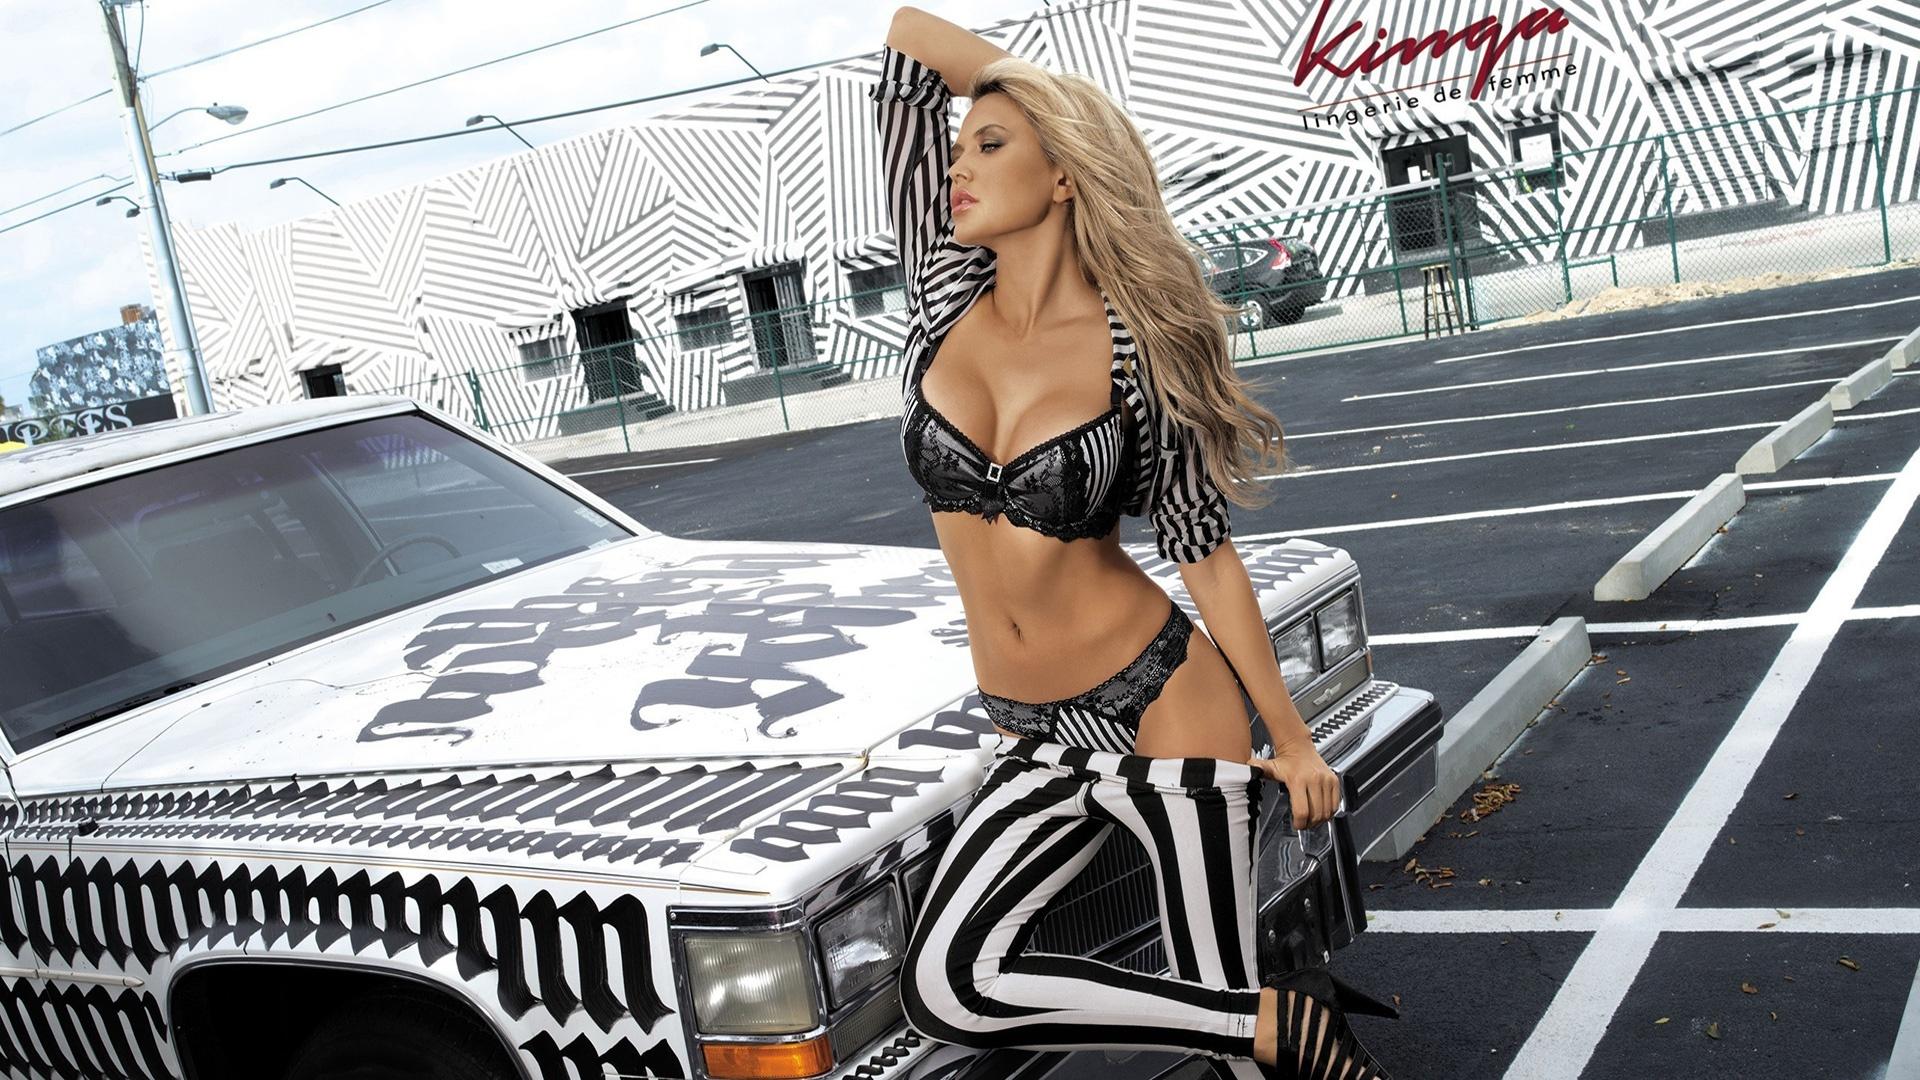 Tetyana Veryovkina hot lingerie and american car for Kinga